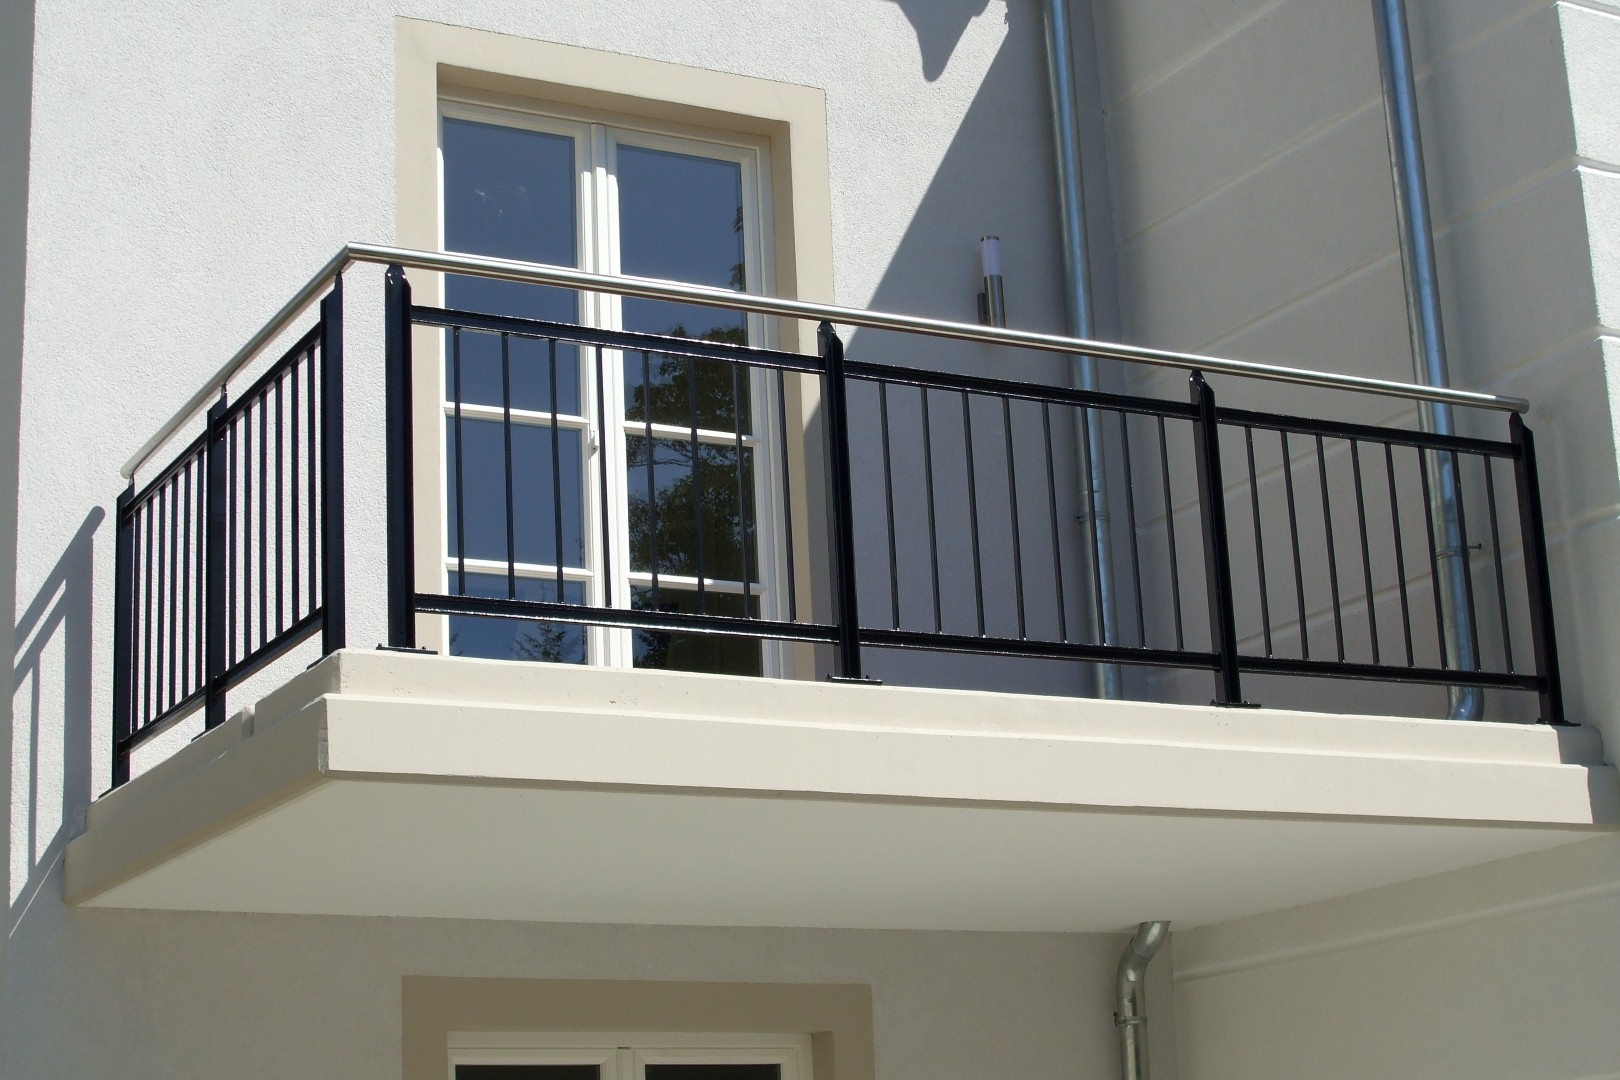 balkon anbauen preis balkon anbauen balkon nachtr glich. Black Bedroom Furniture Sets. Home Design Ideas